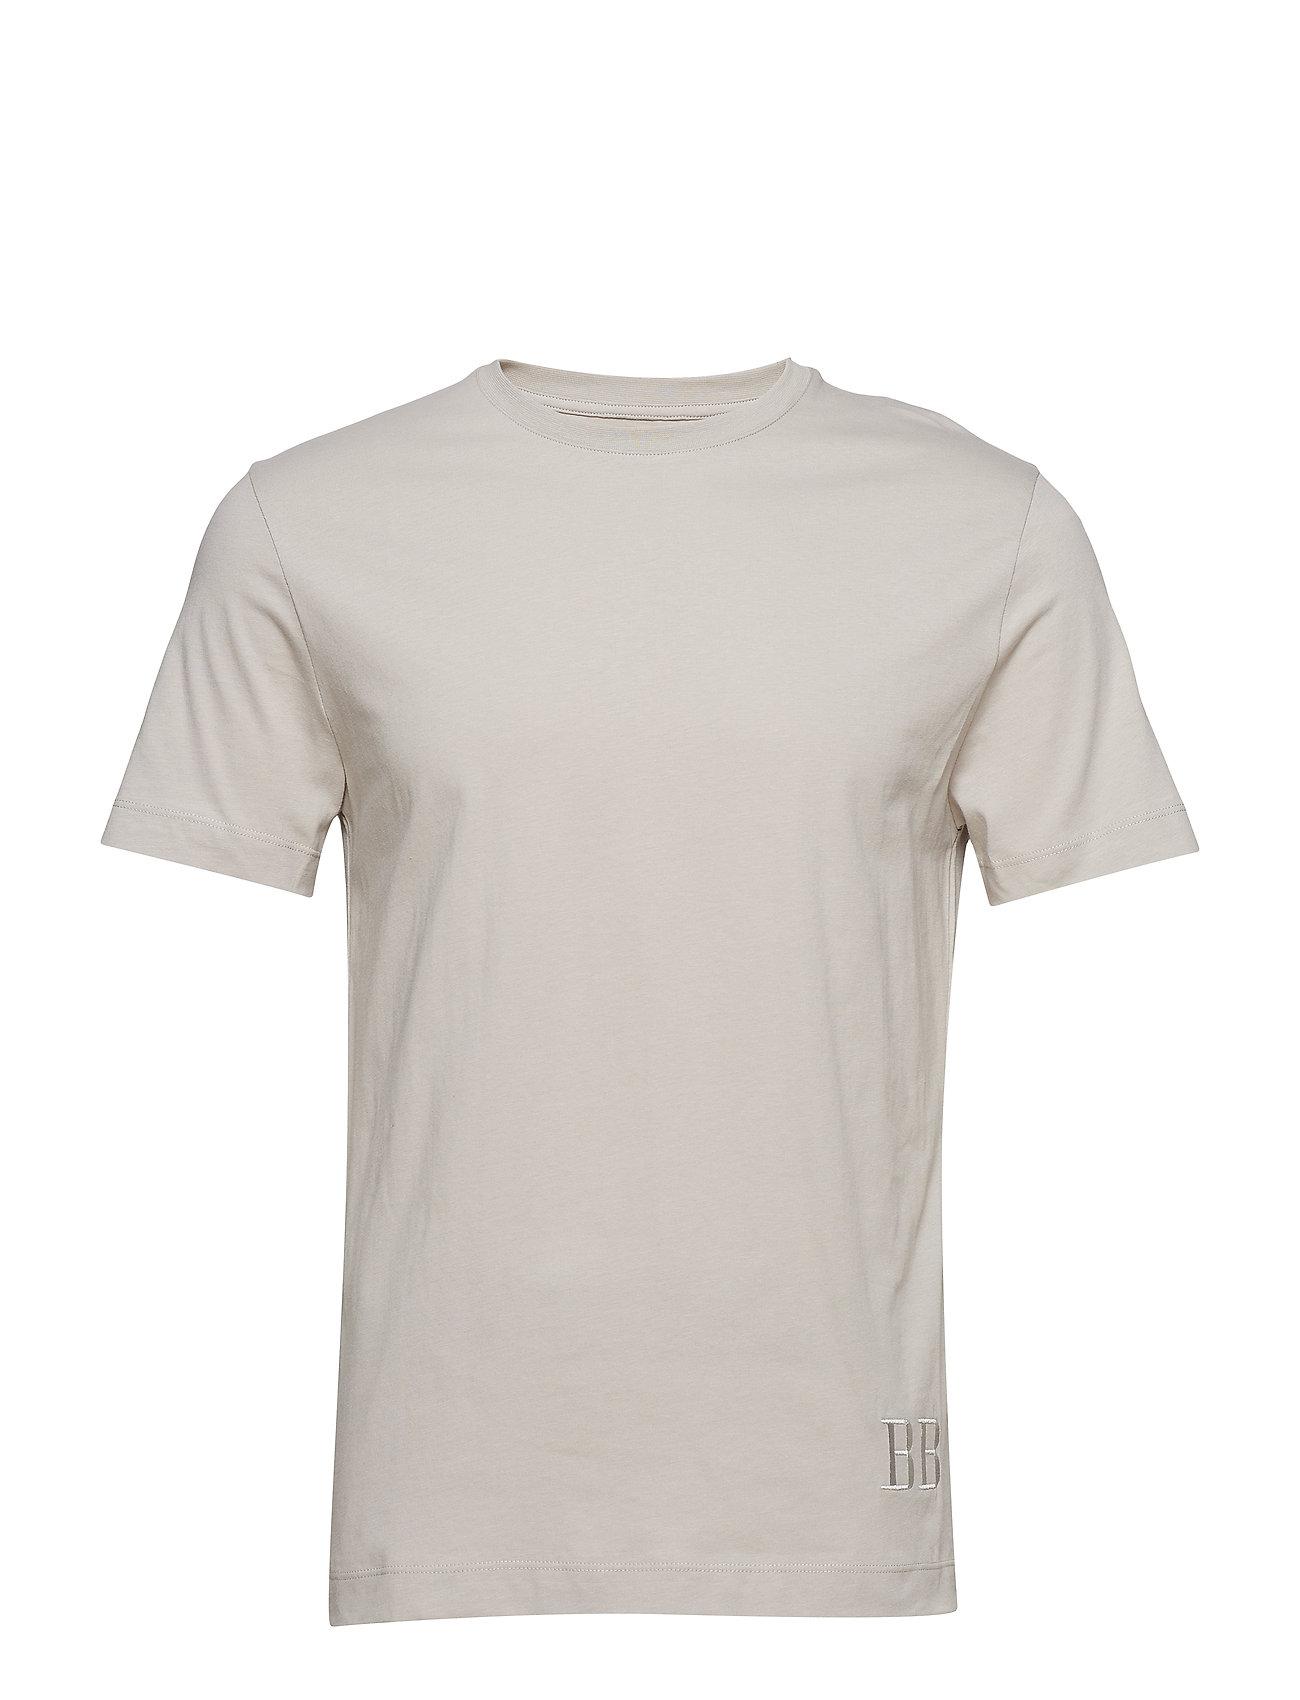 Art Bazaar GreyBruuns Gustav shirtpearl T 3Tlc1FKJ